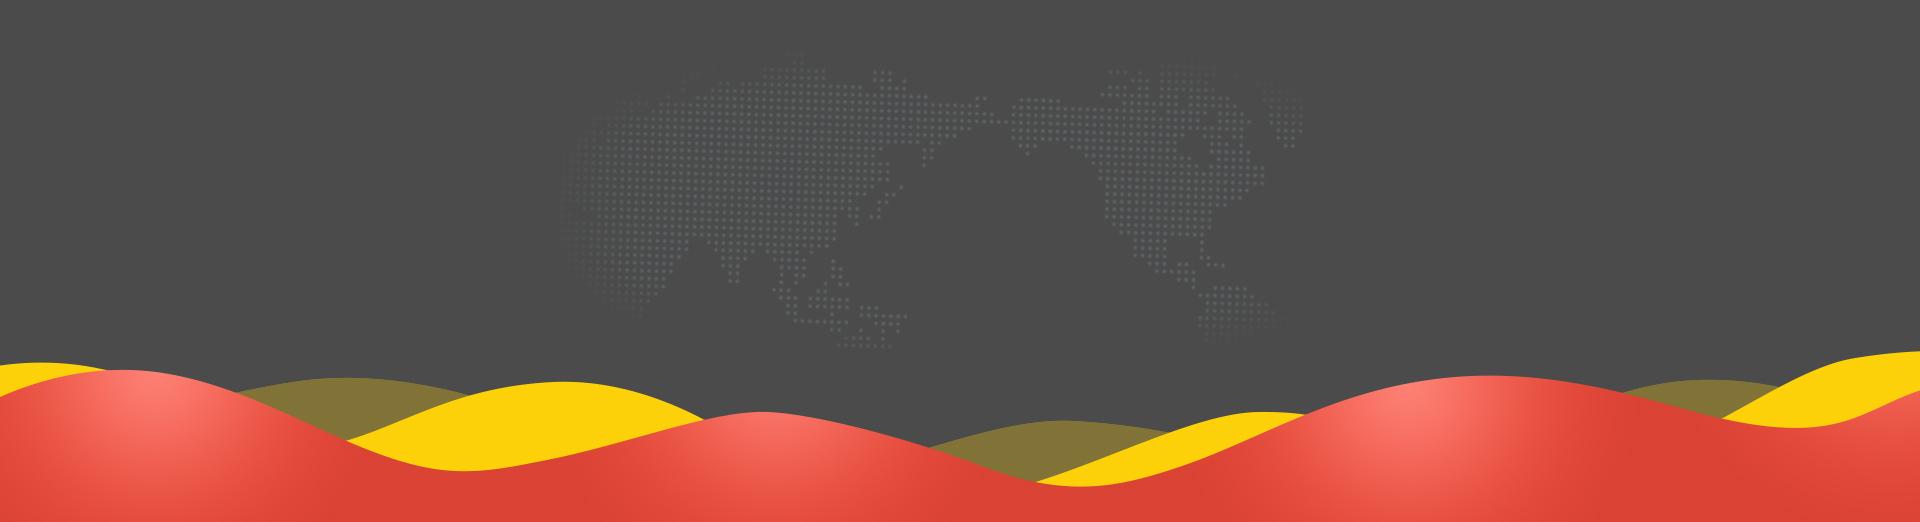 betvlctor伟德中文网站betvictor食品集团有限公司